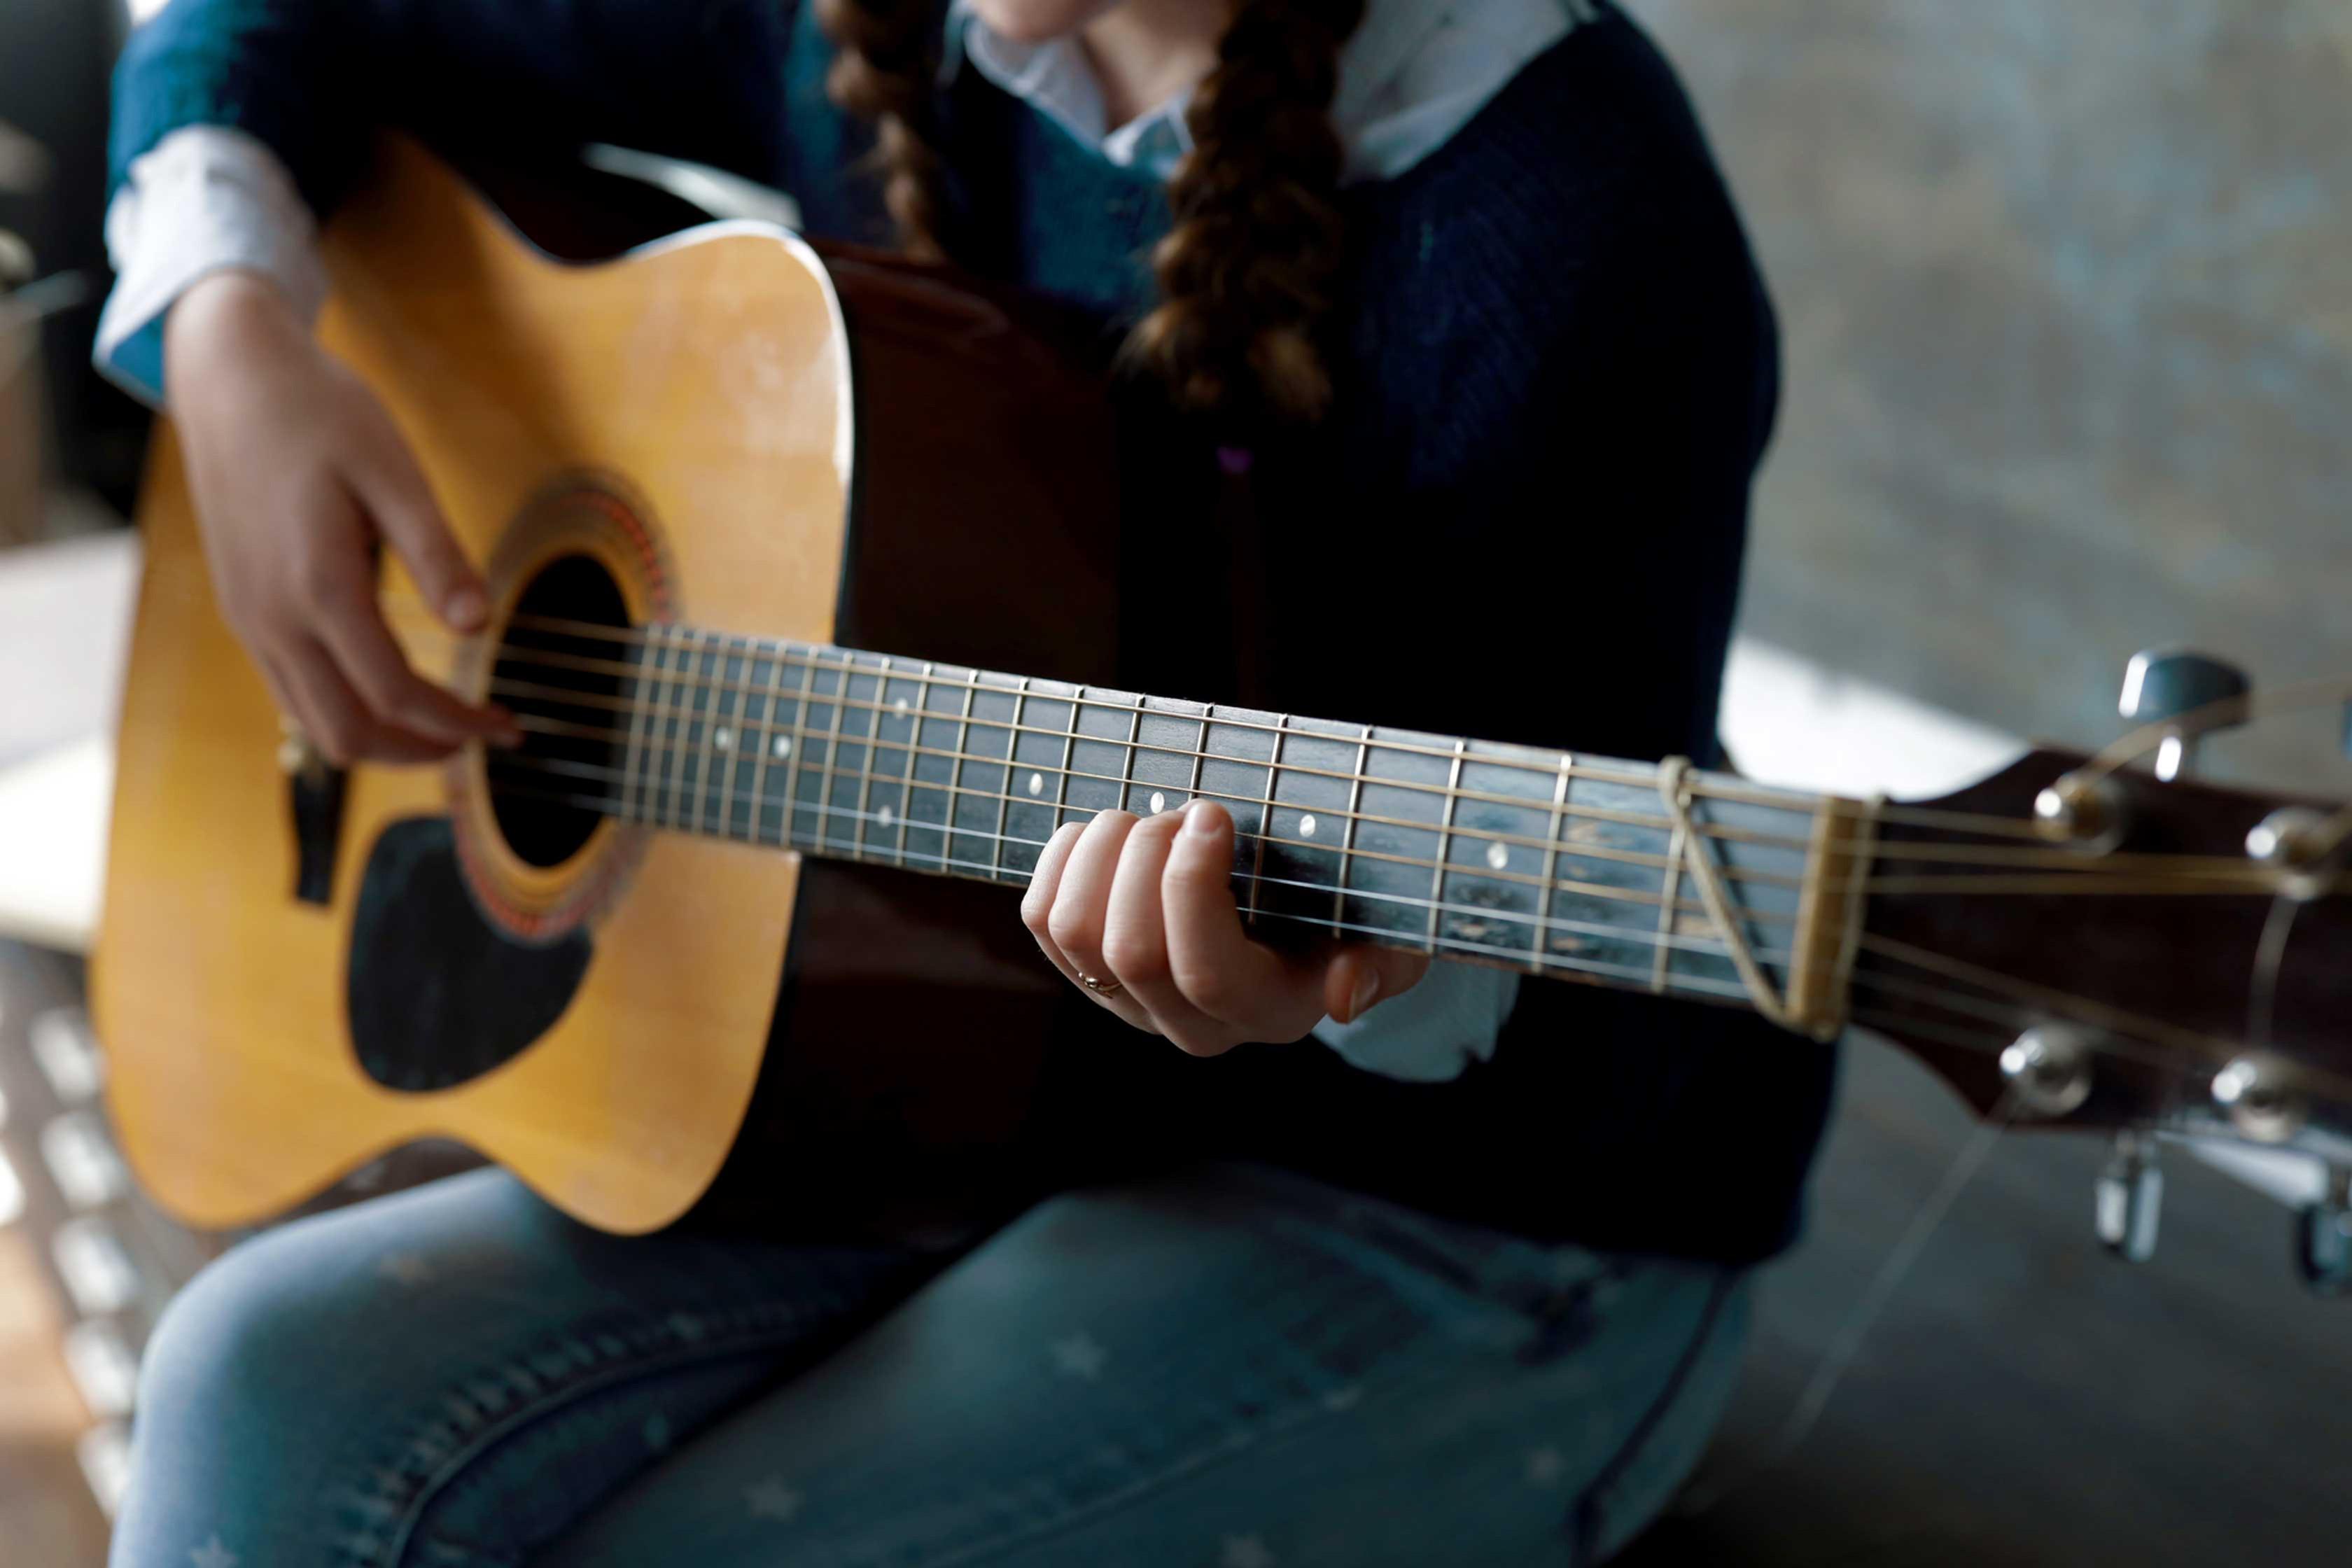 Beginner's Guitar Lesson (1to1)